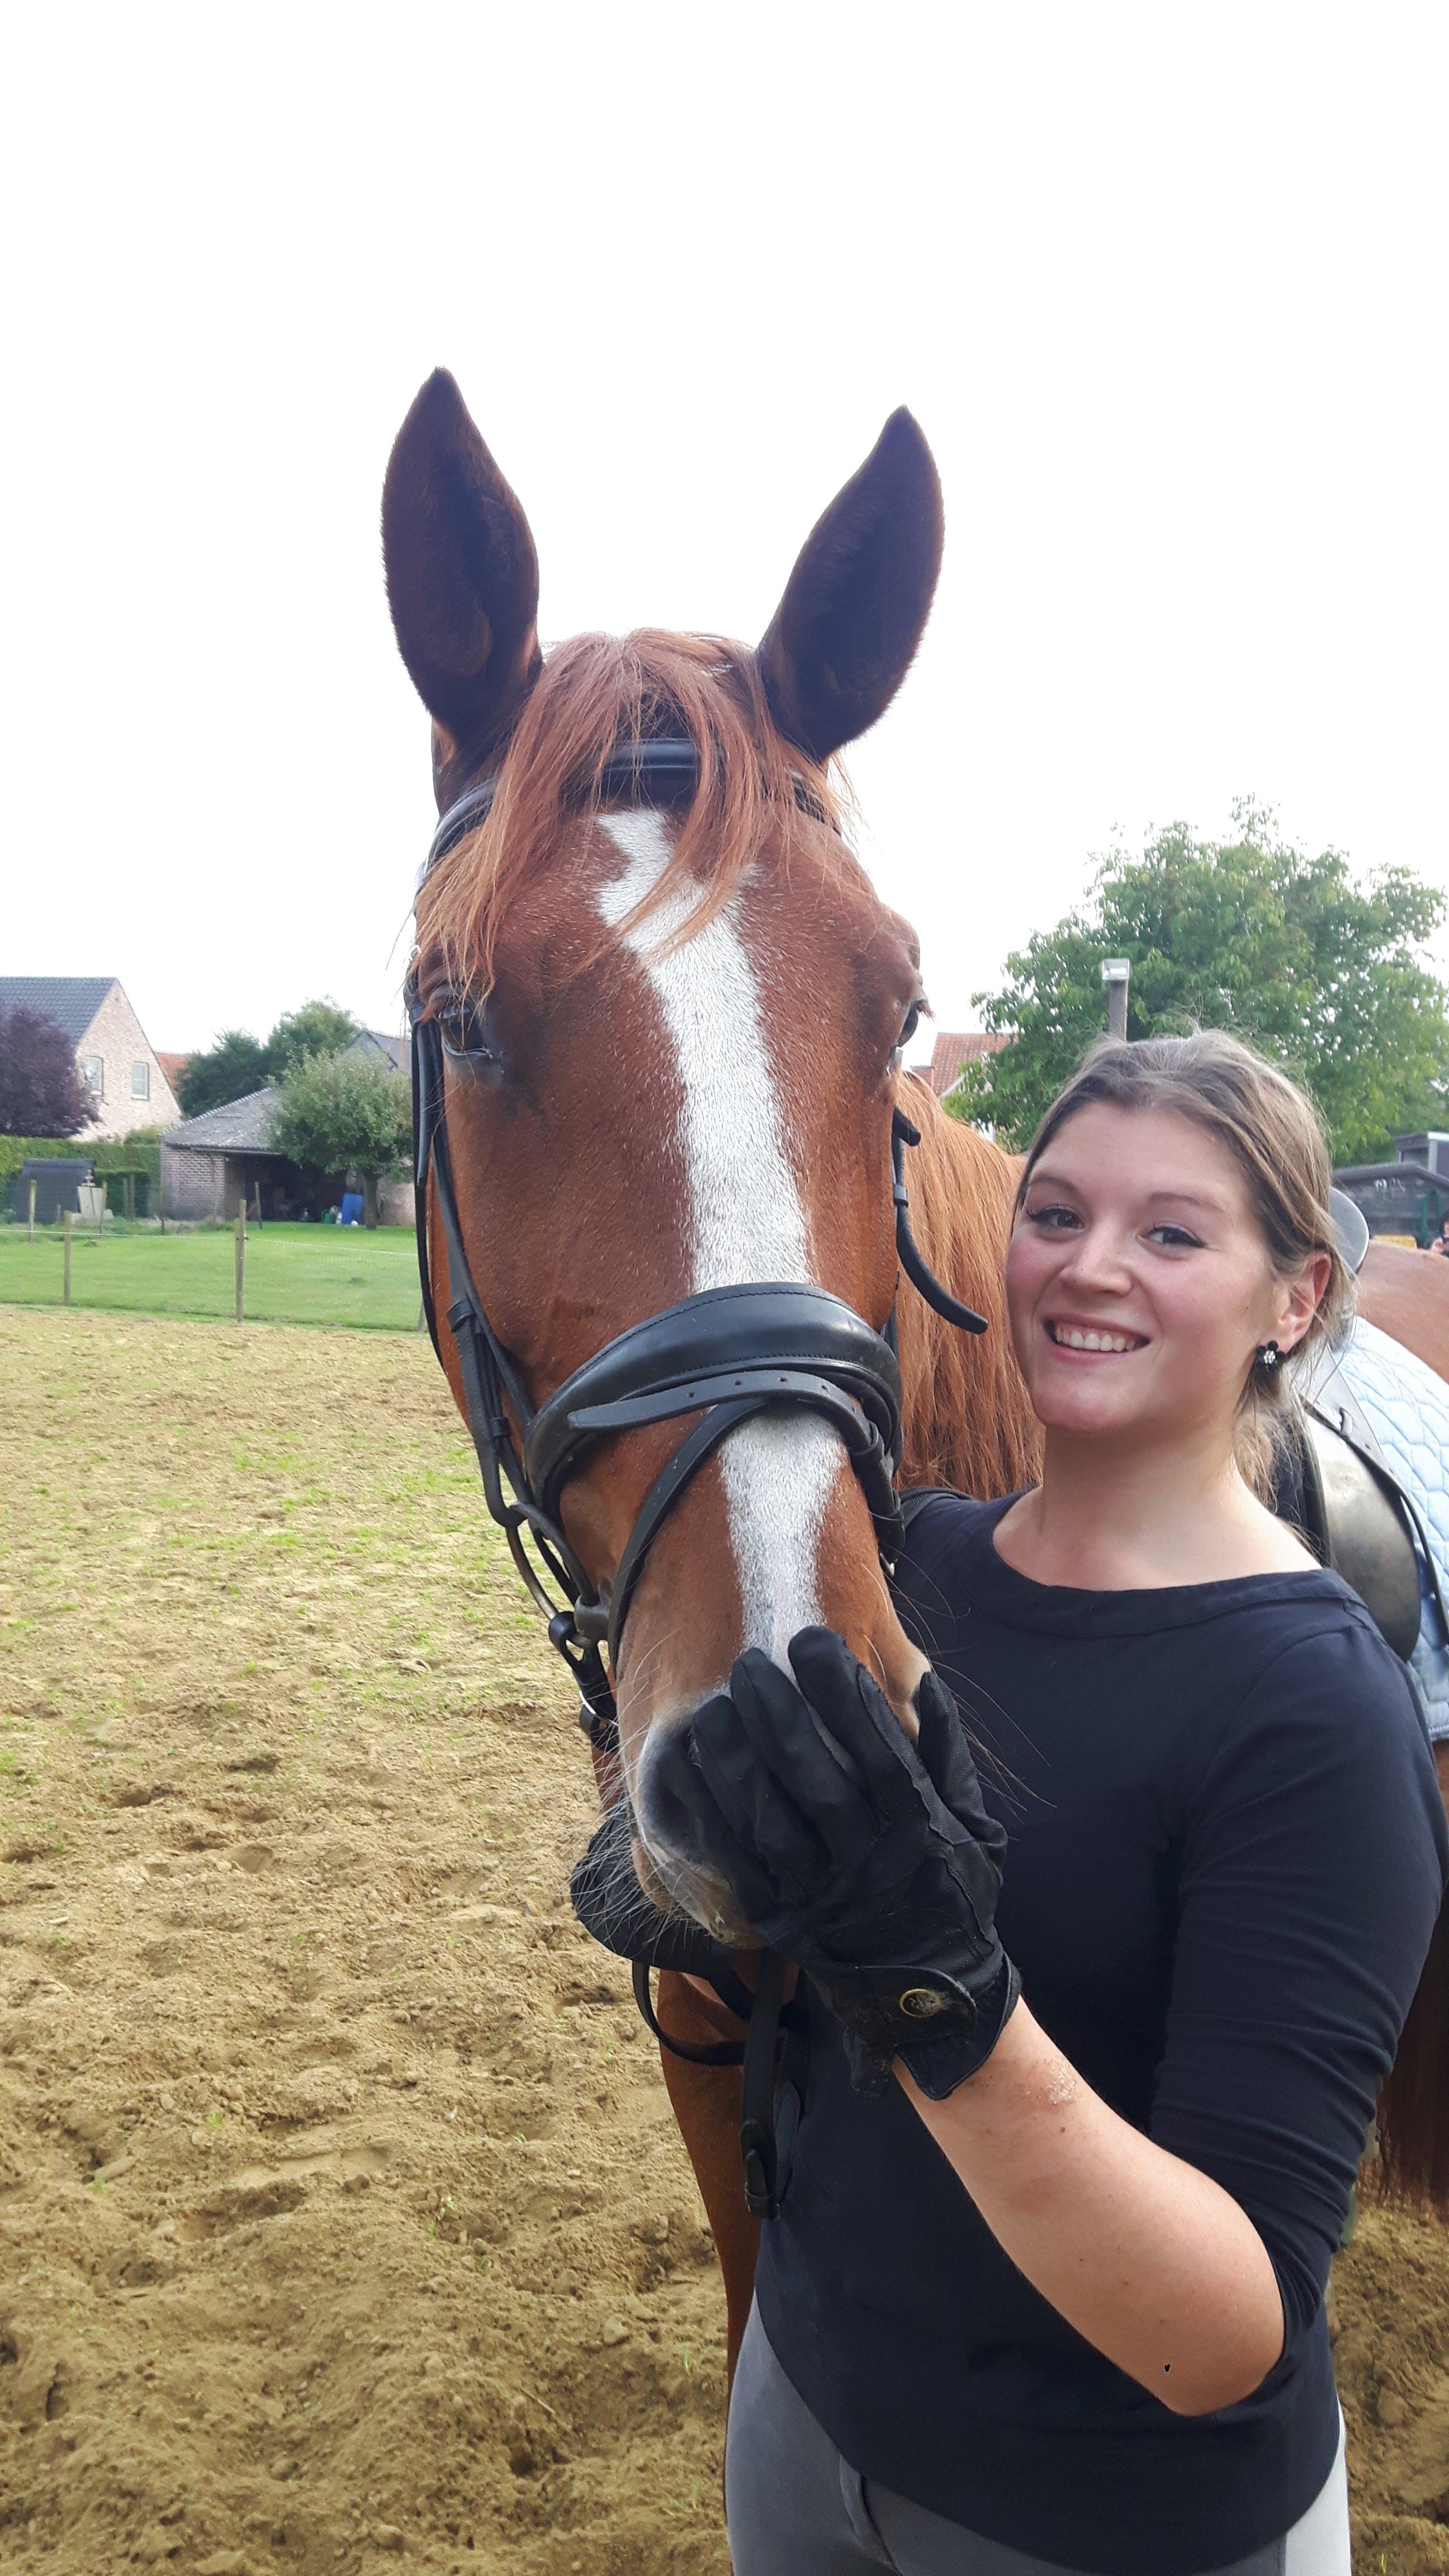 Horseback Riding, Horses Dressage, Music History, Music Theory, Guitar, English Adults, English as Second Language (ESL), English Students in Stekene, Belgique